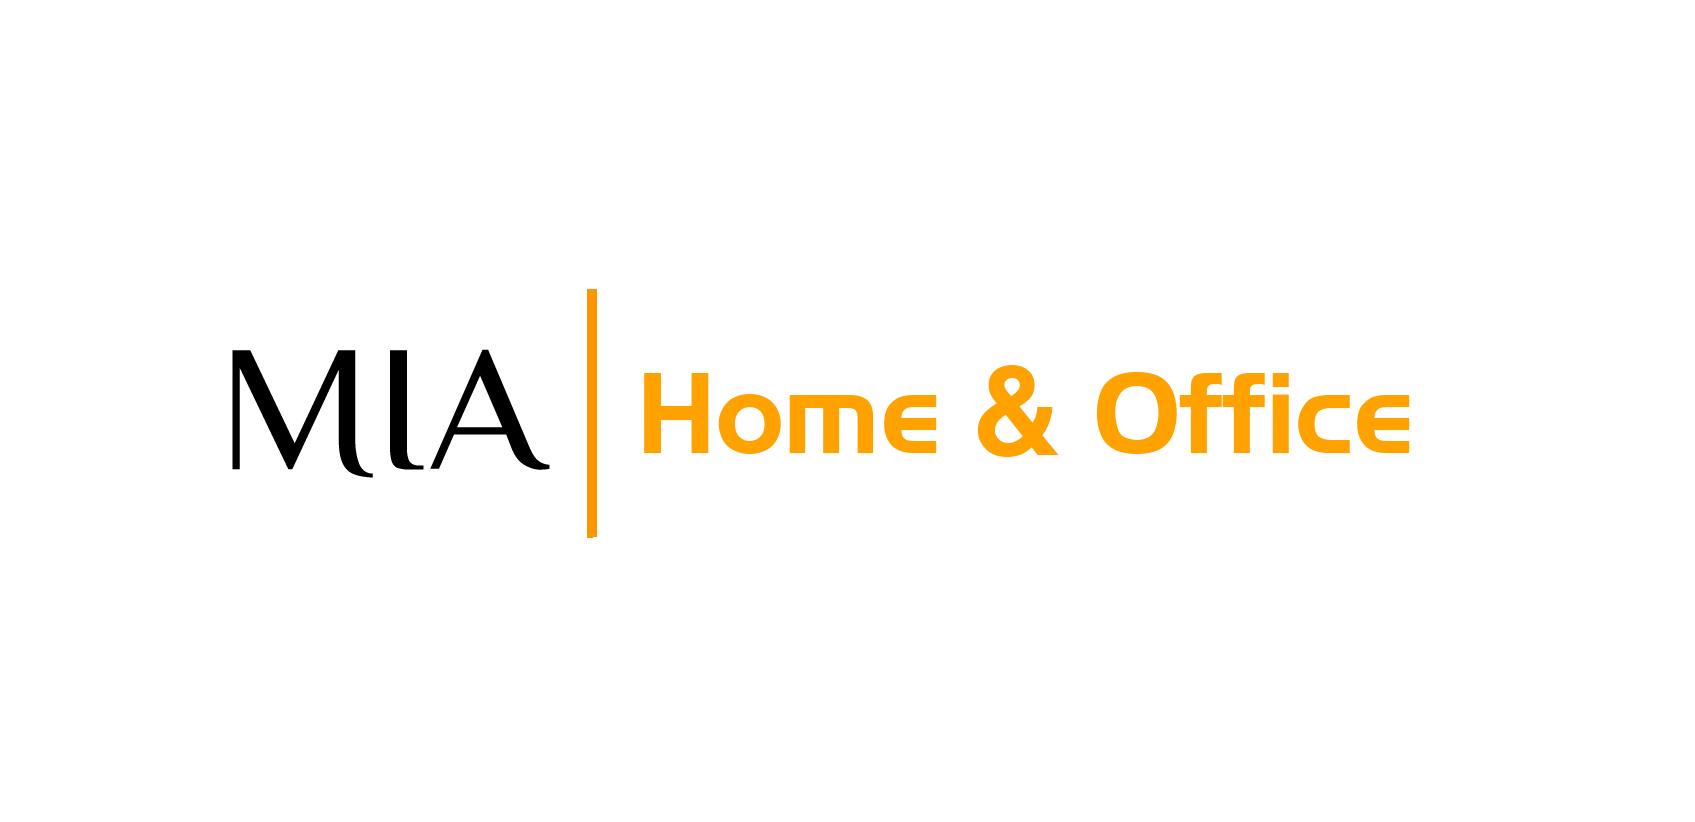 Mia Home & Office